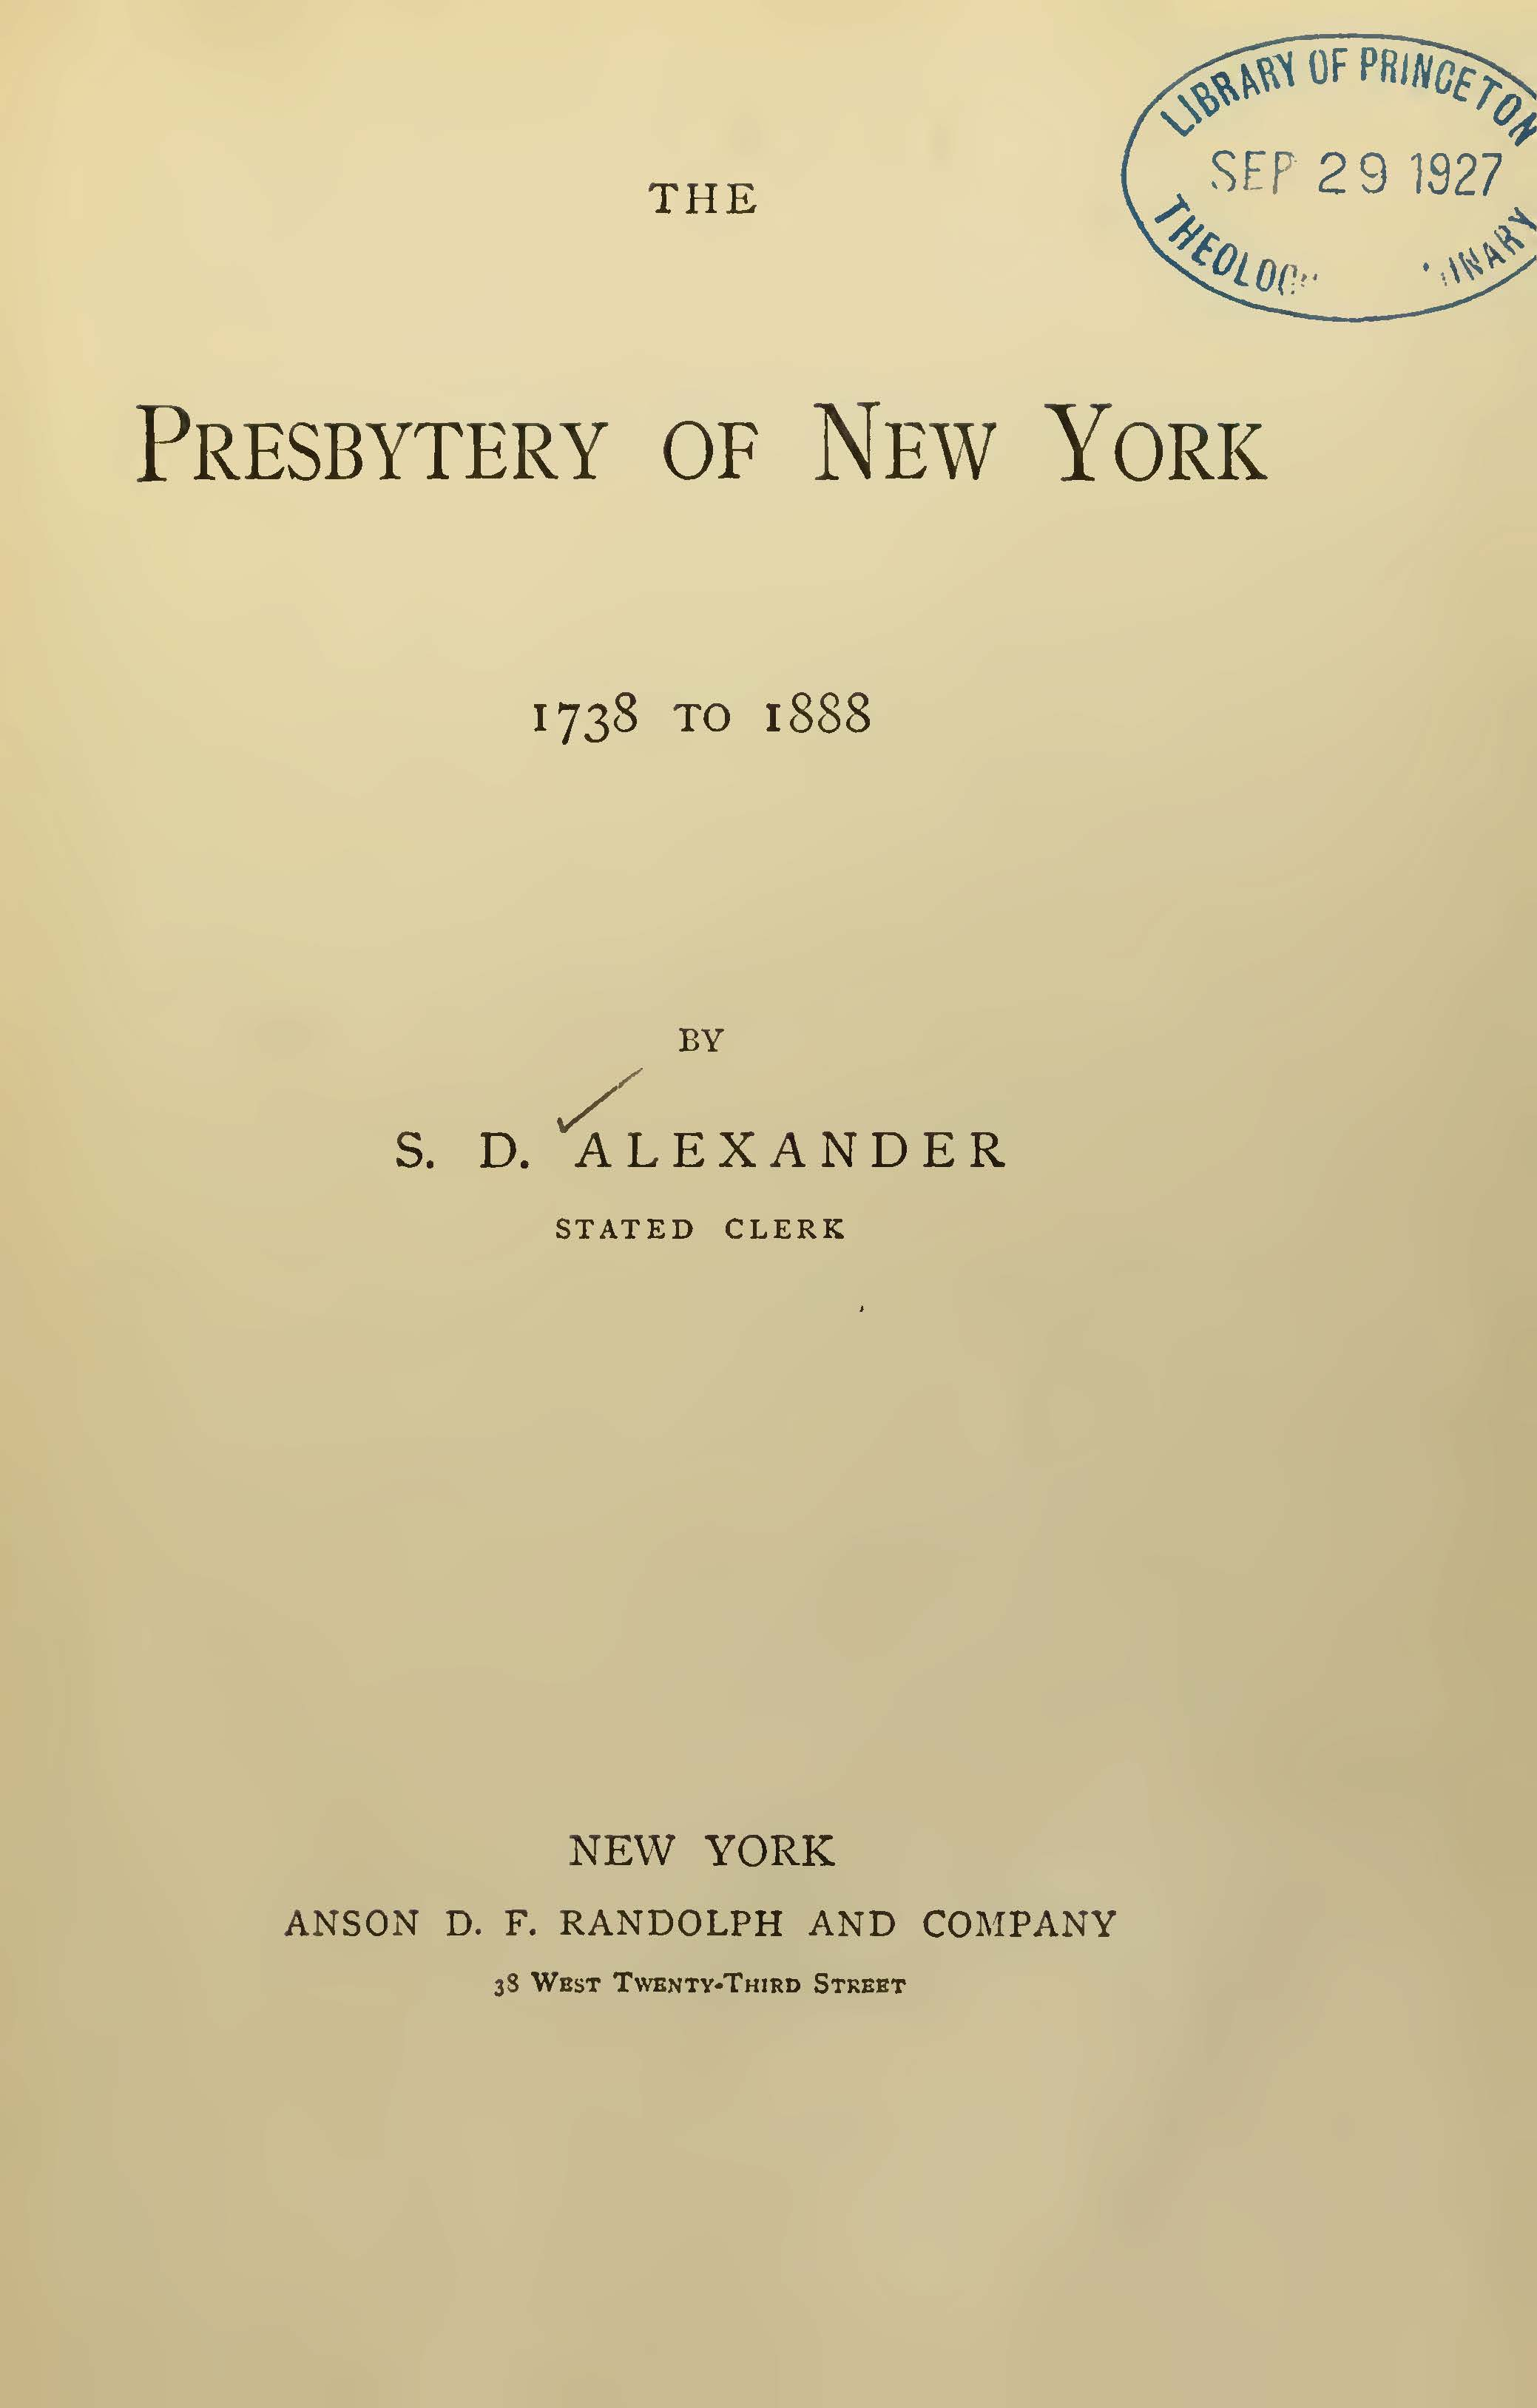 Alexander, Samuel Davies, The Presbytery of New York, 1738 to 1888 Title Page.jpg